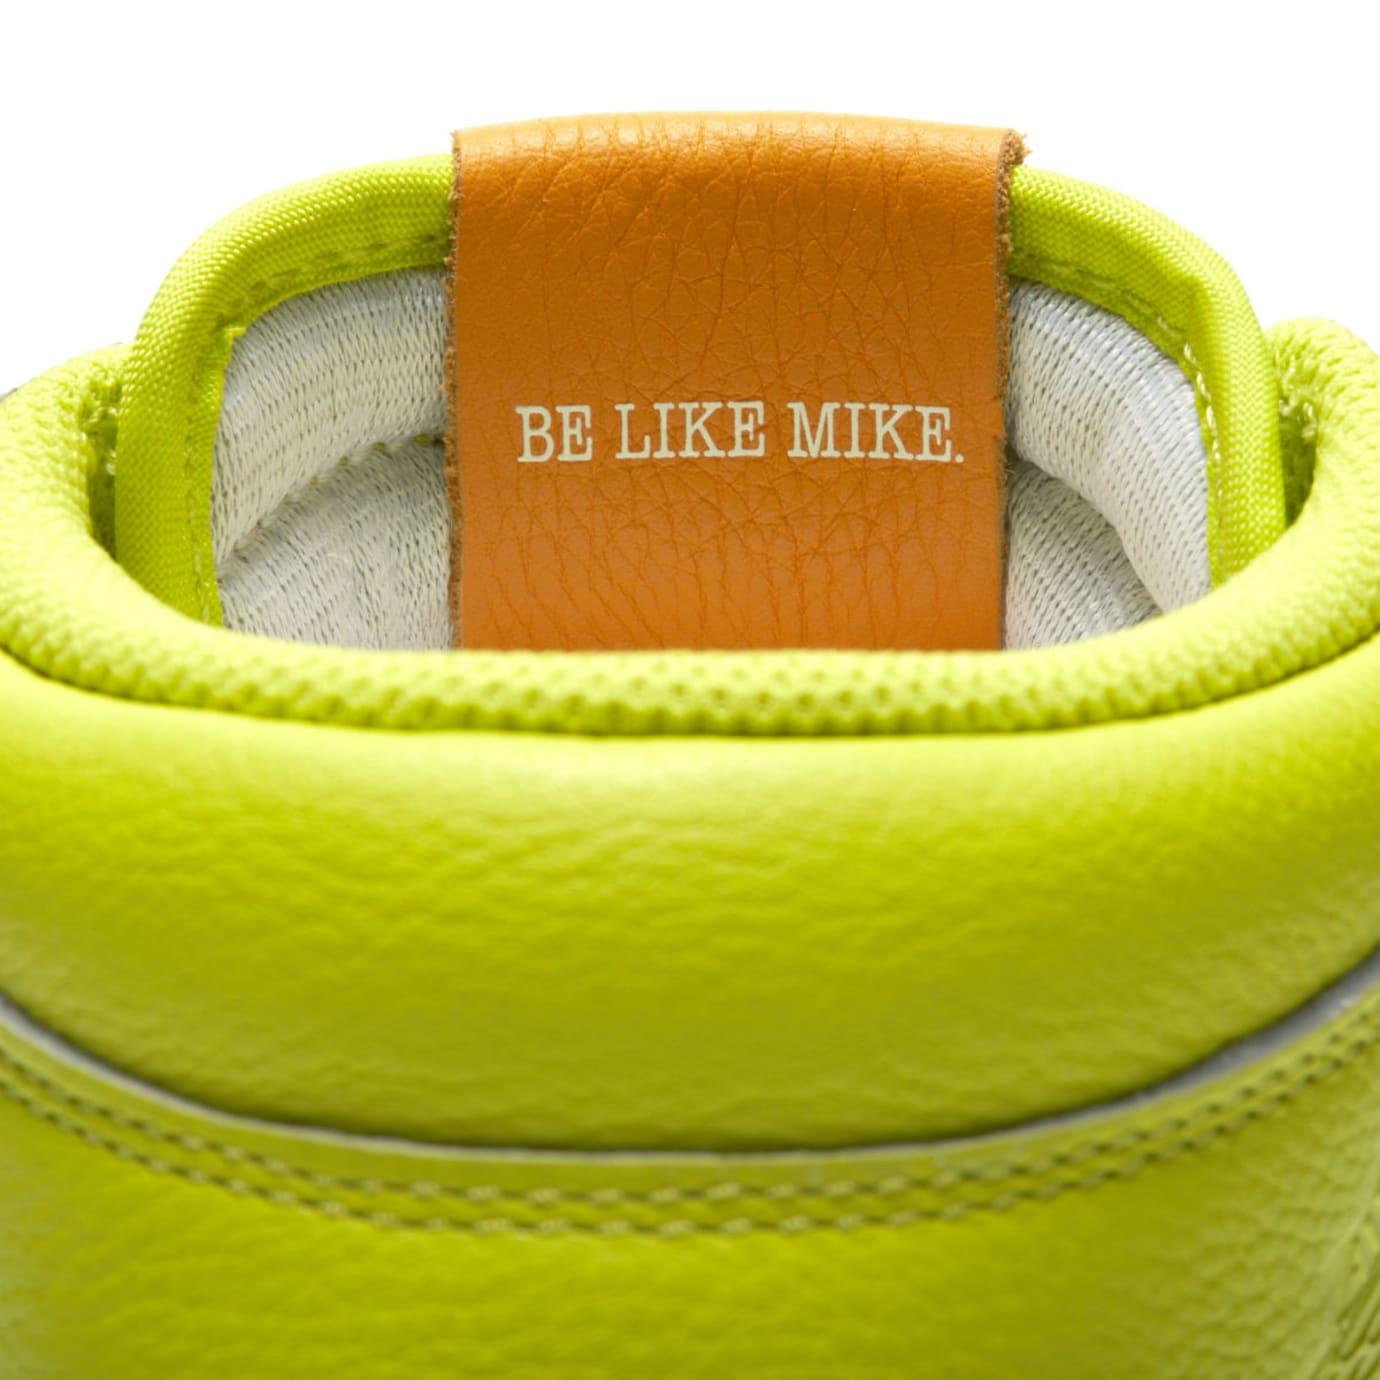 Air Jordan 1 Gatorade Cyber Yellow Lime Release Date AJ5997-345 Tongue